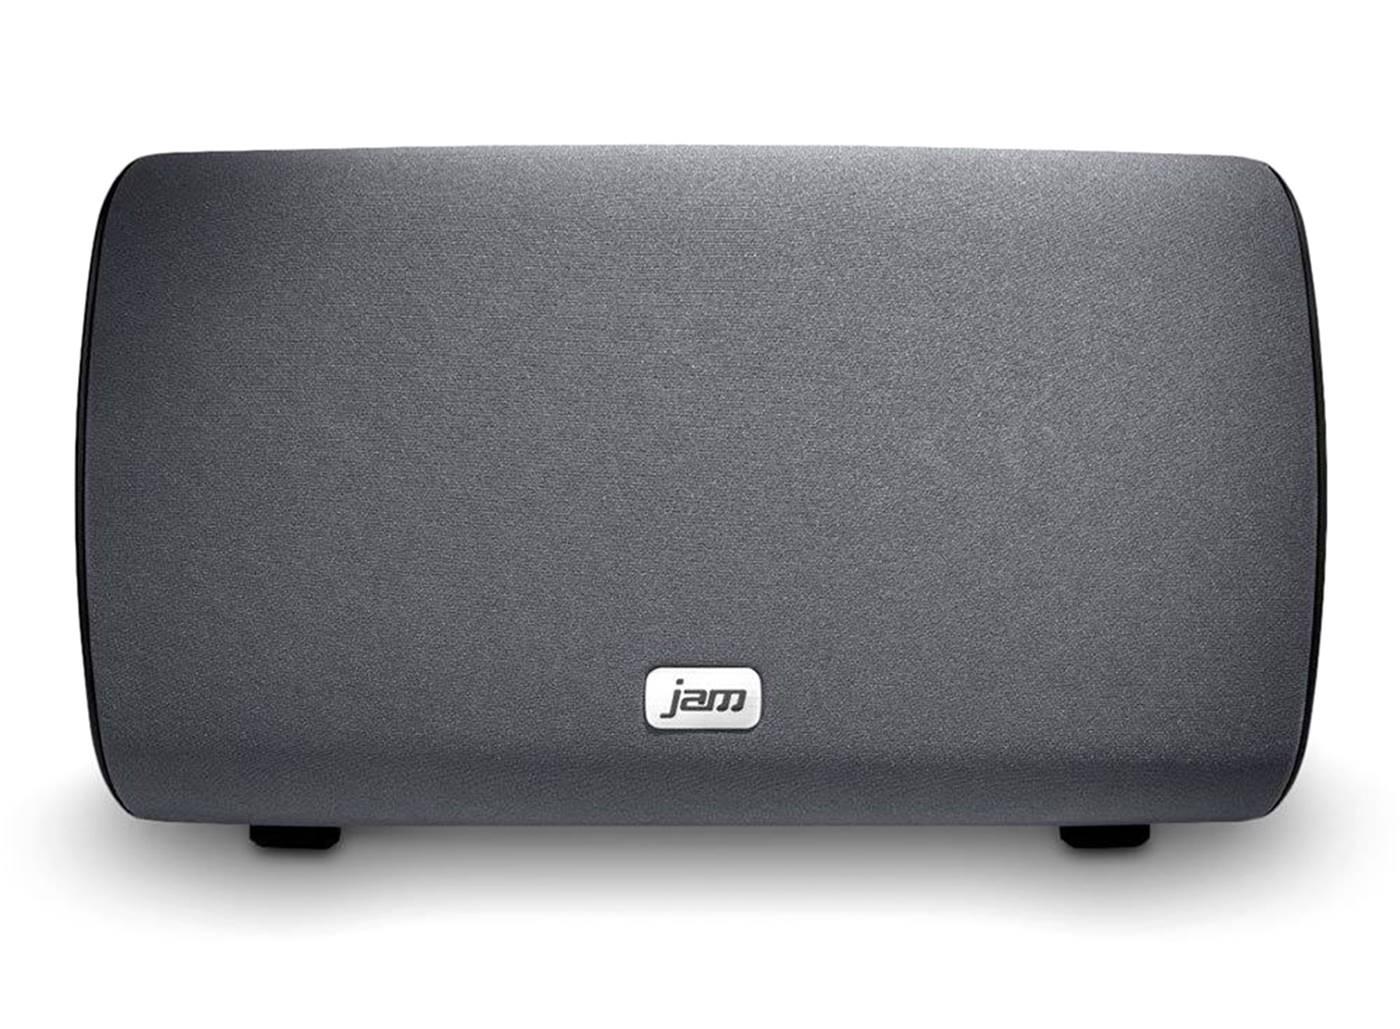 JAM Symphony Smart Speaker